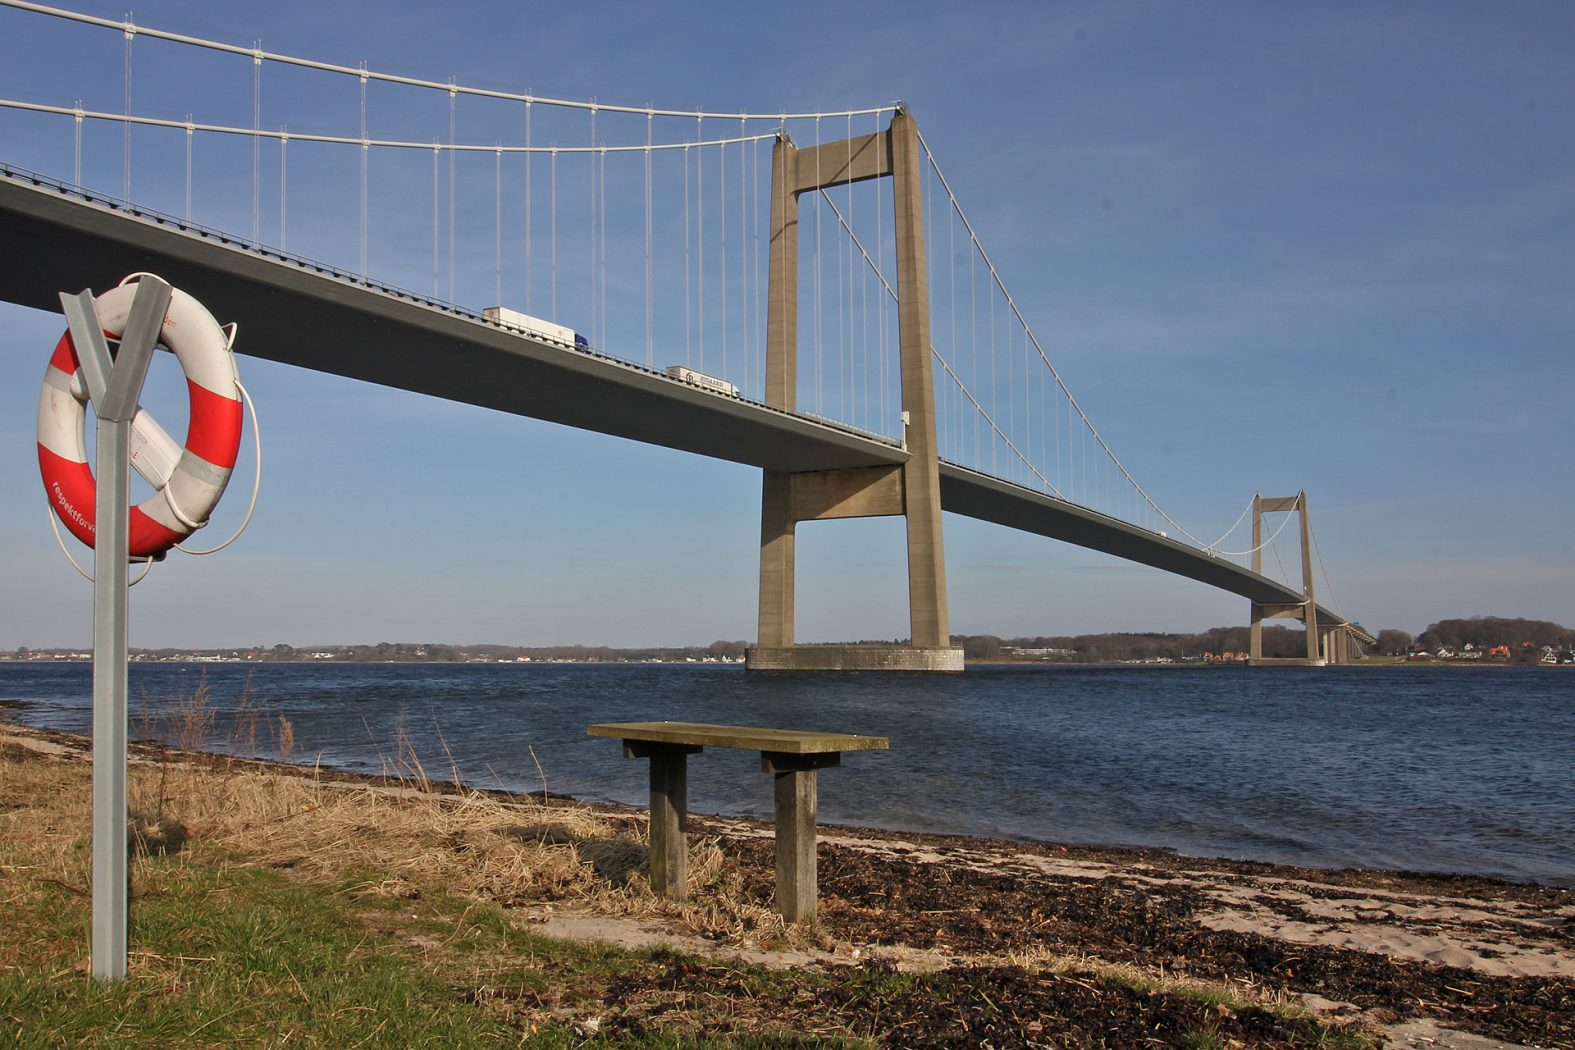 Angeln an Kleine Belt-Brücke